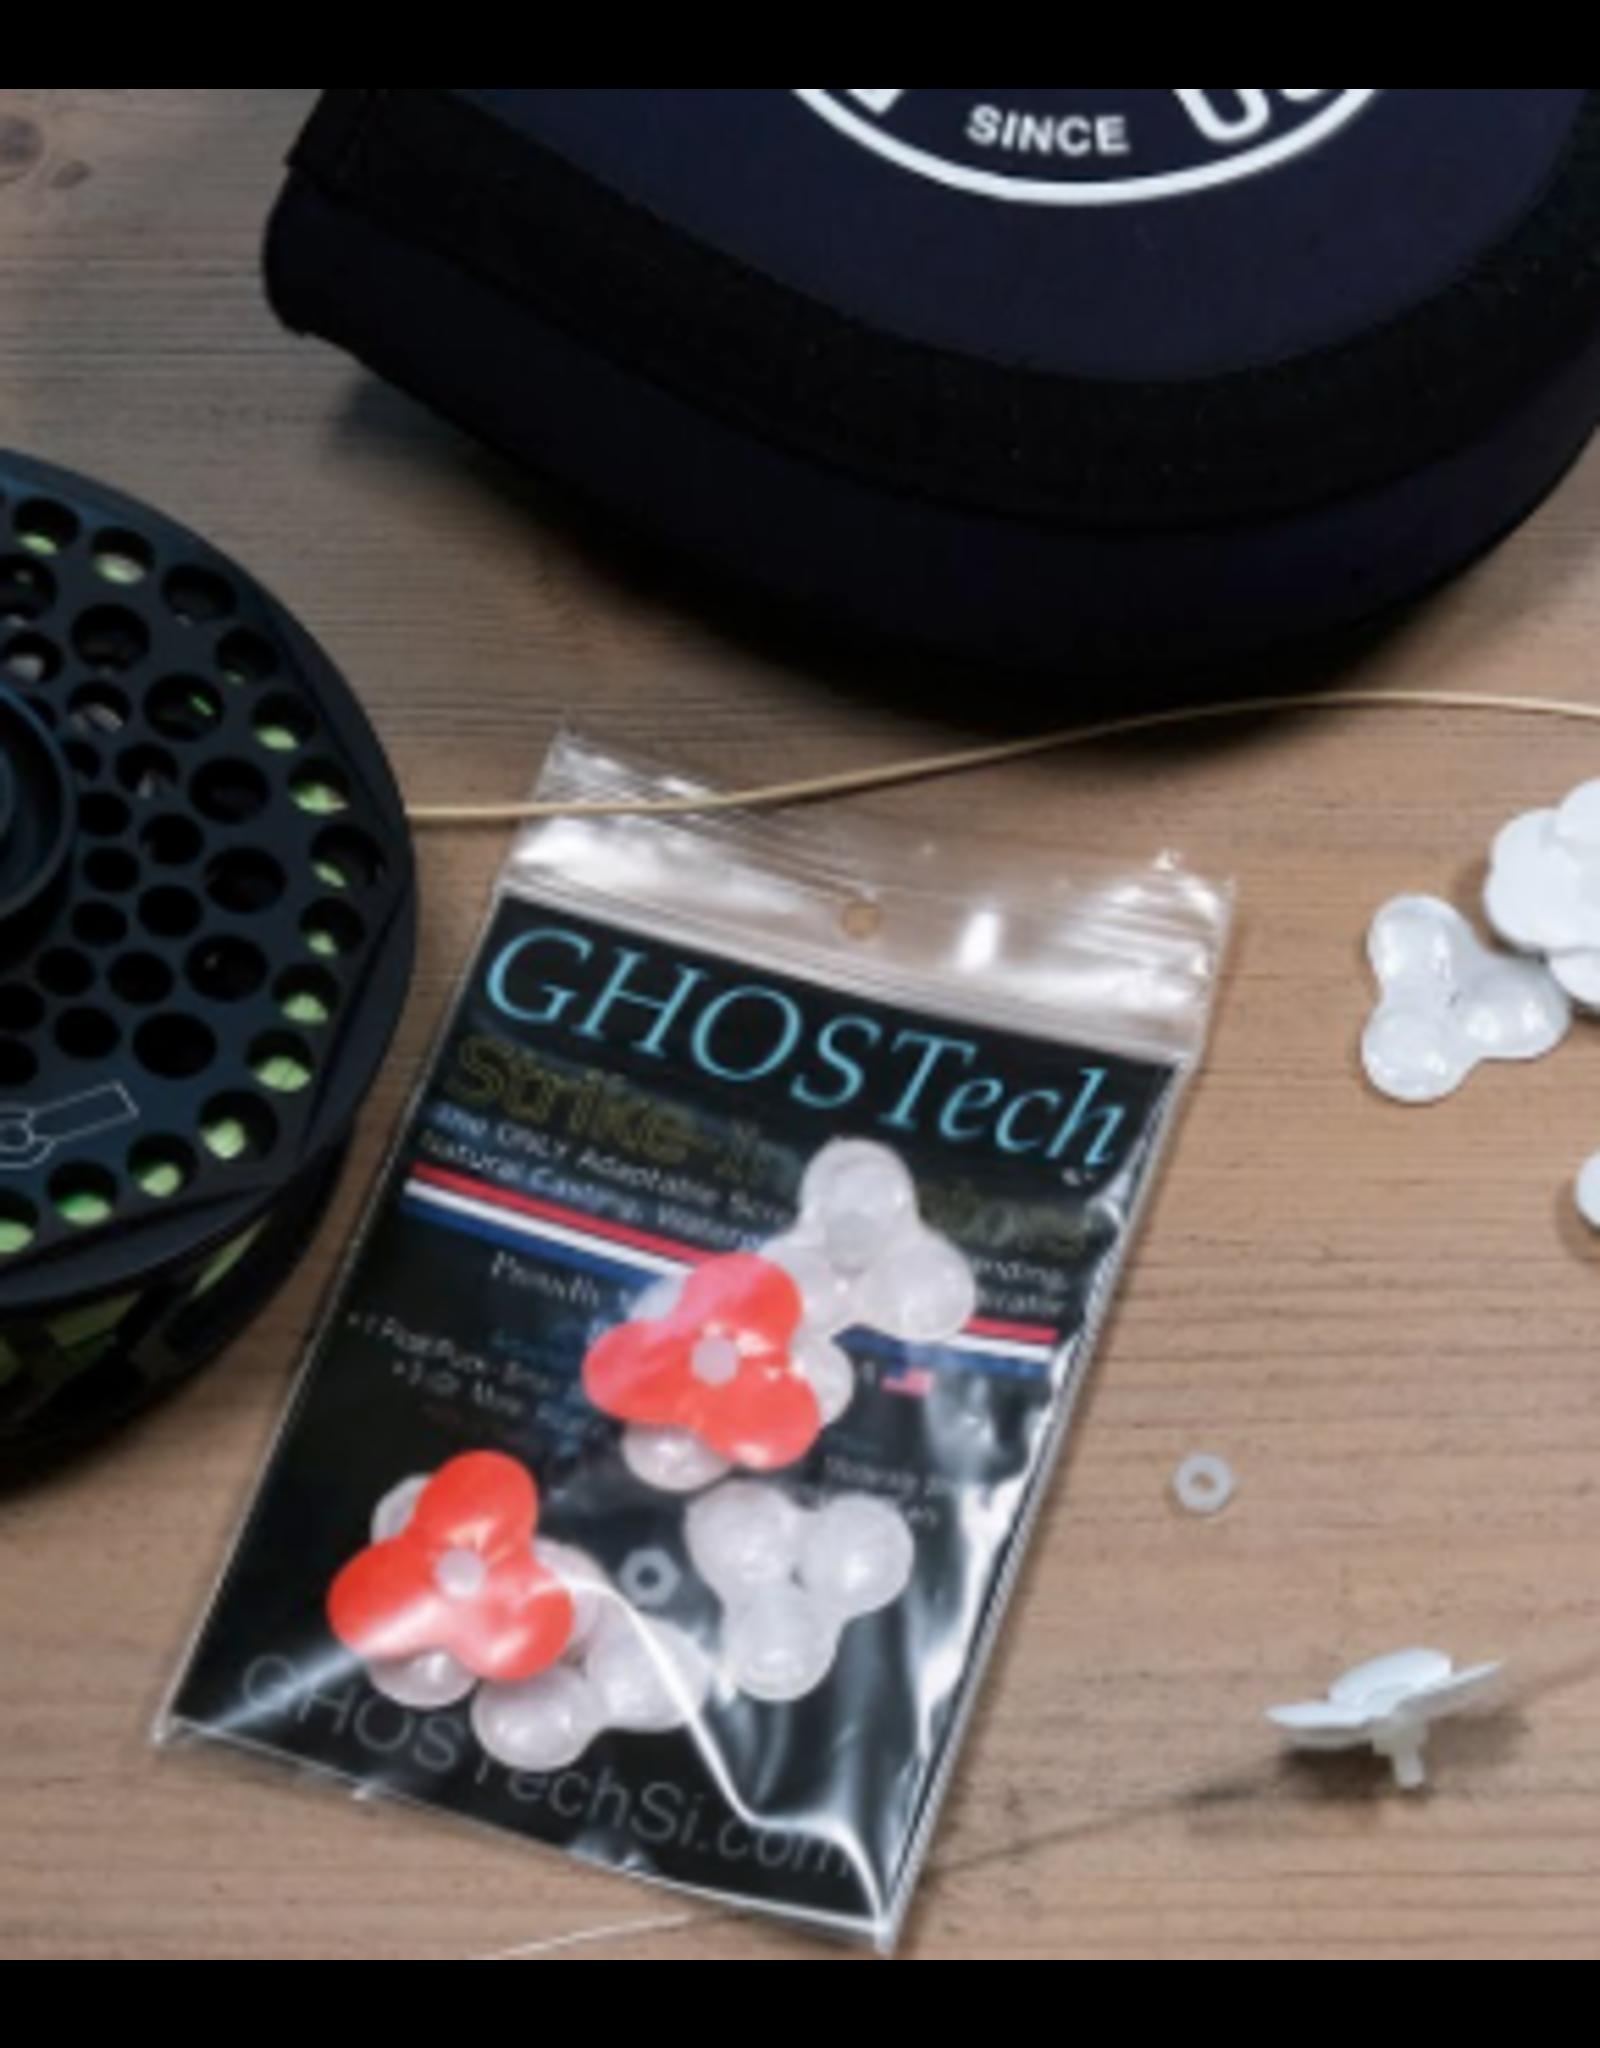 GhostTech GHOSTech Strike Indicator